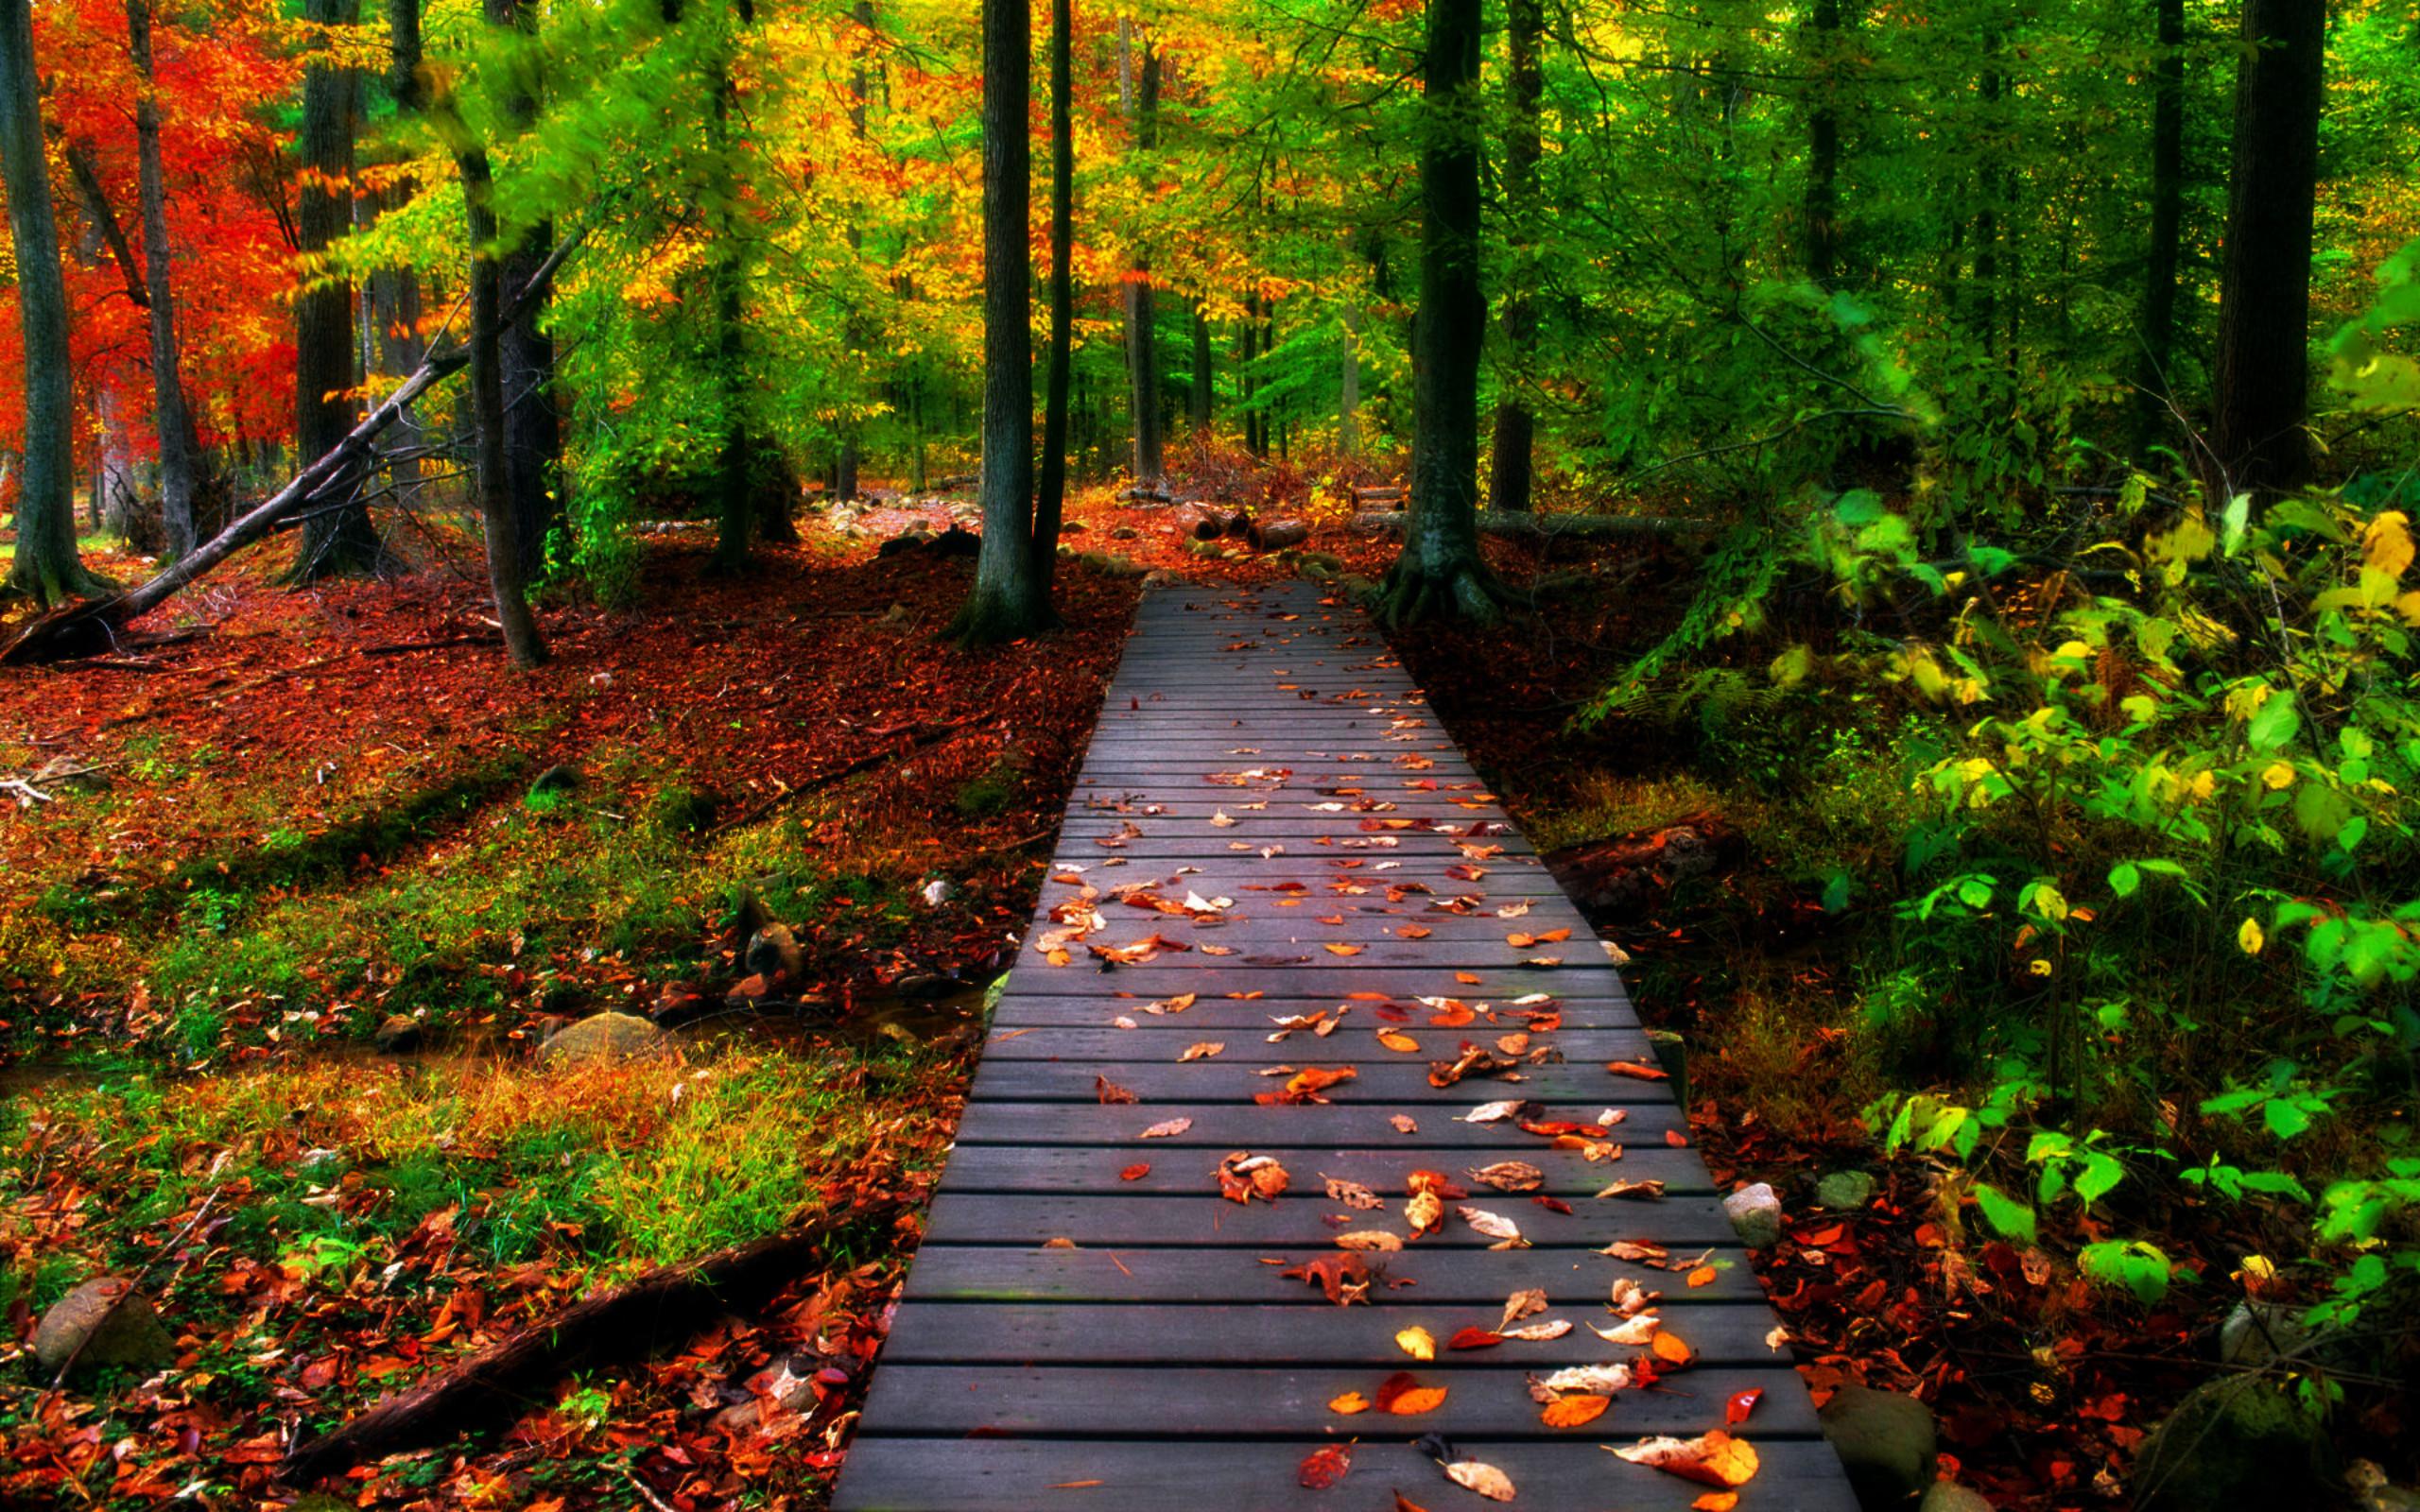 Free Fall Foliage Image Background Photos Mac Wallpapers - Nature Wallpaper Background - HD Wallpaper